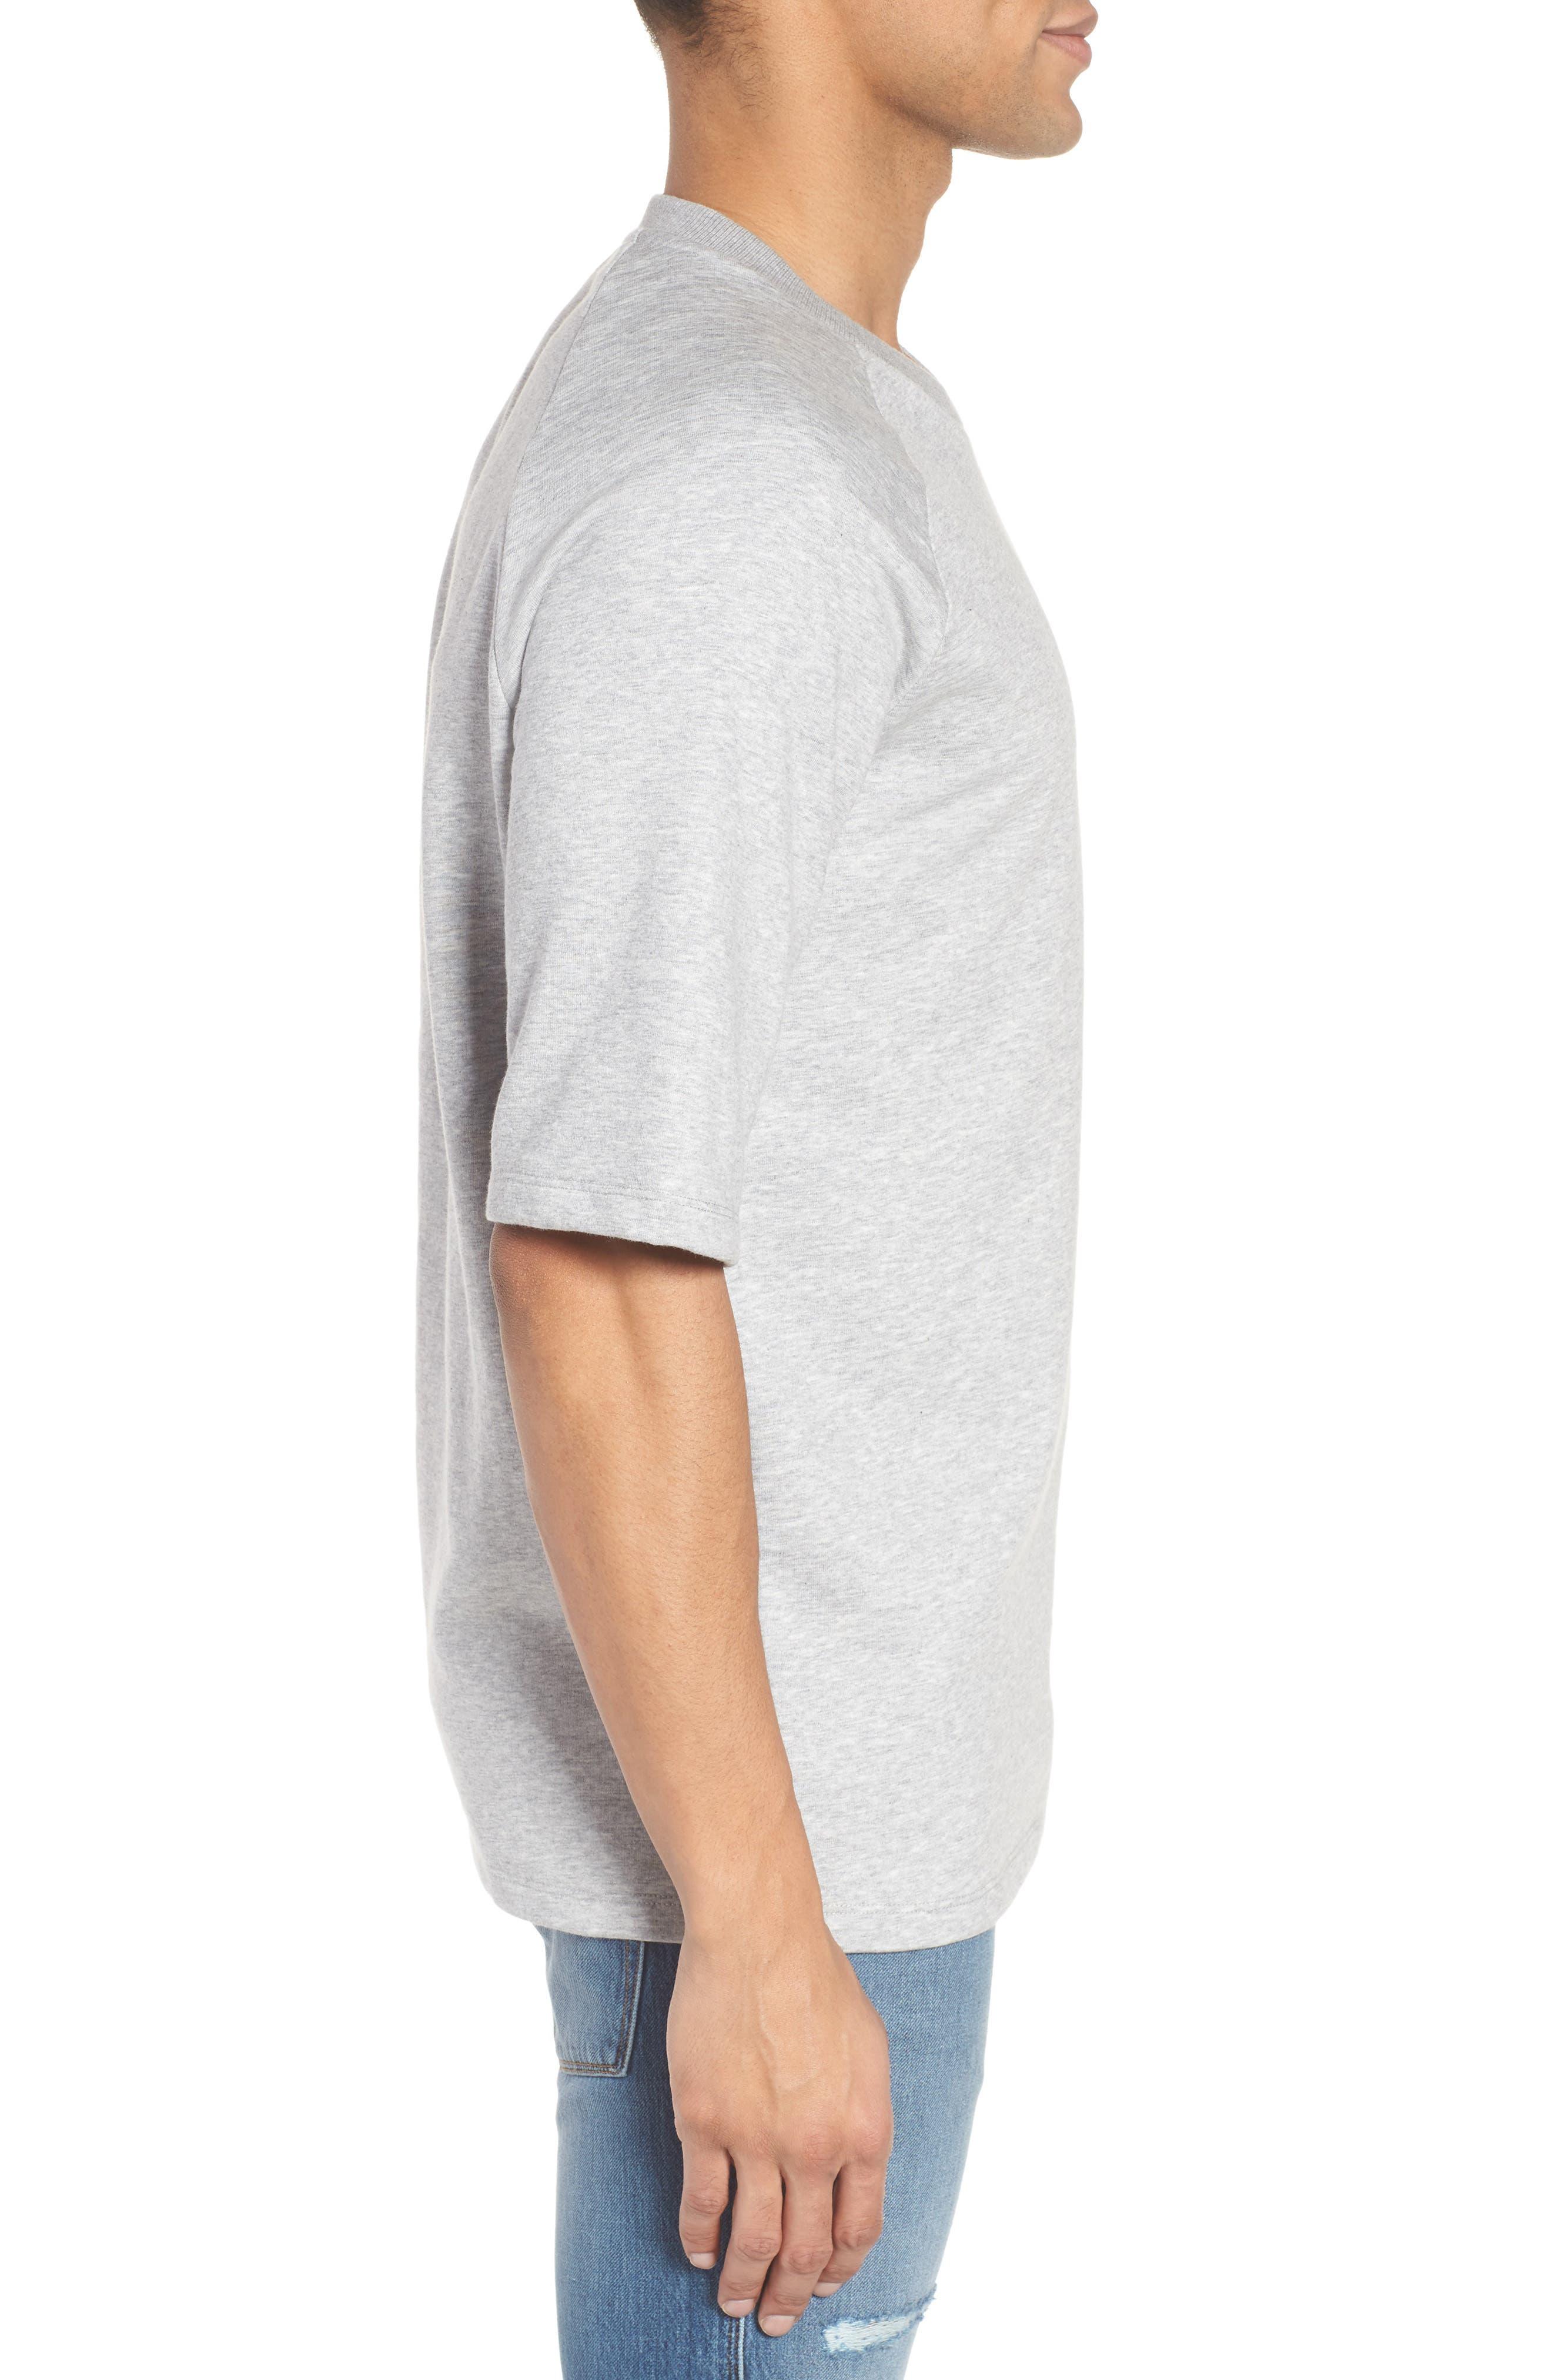 Deast Doodle Sweatshirt,                             Alternate thumbnail 3, color,                             Grey